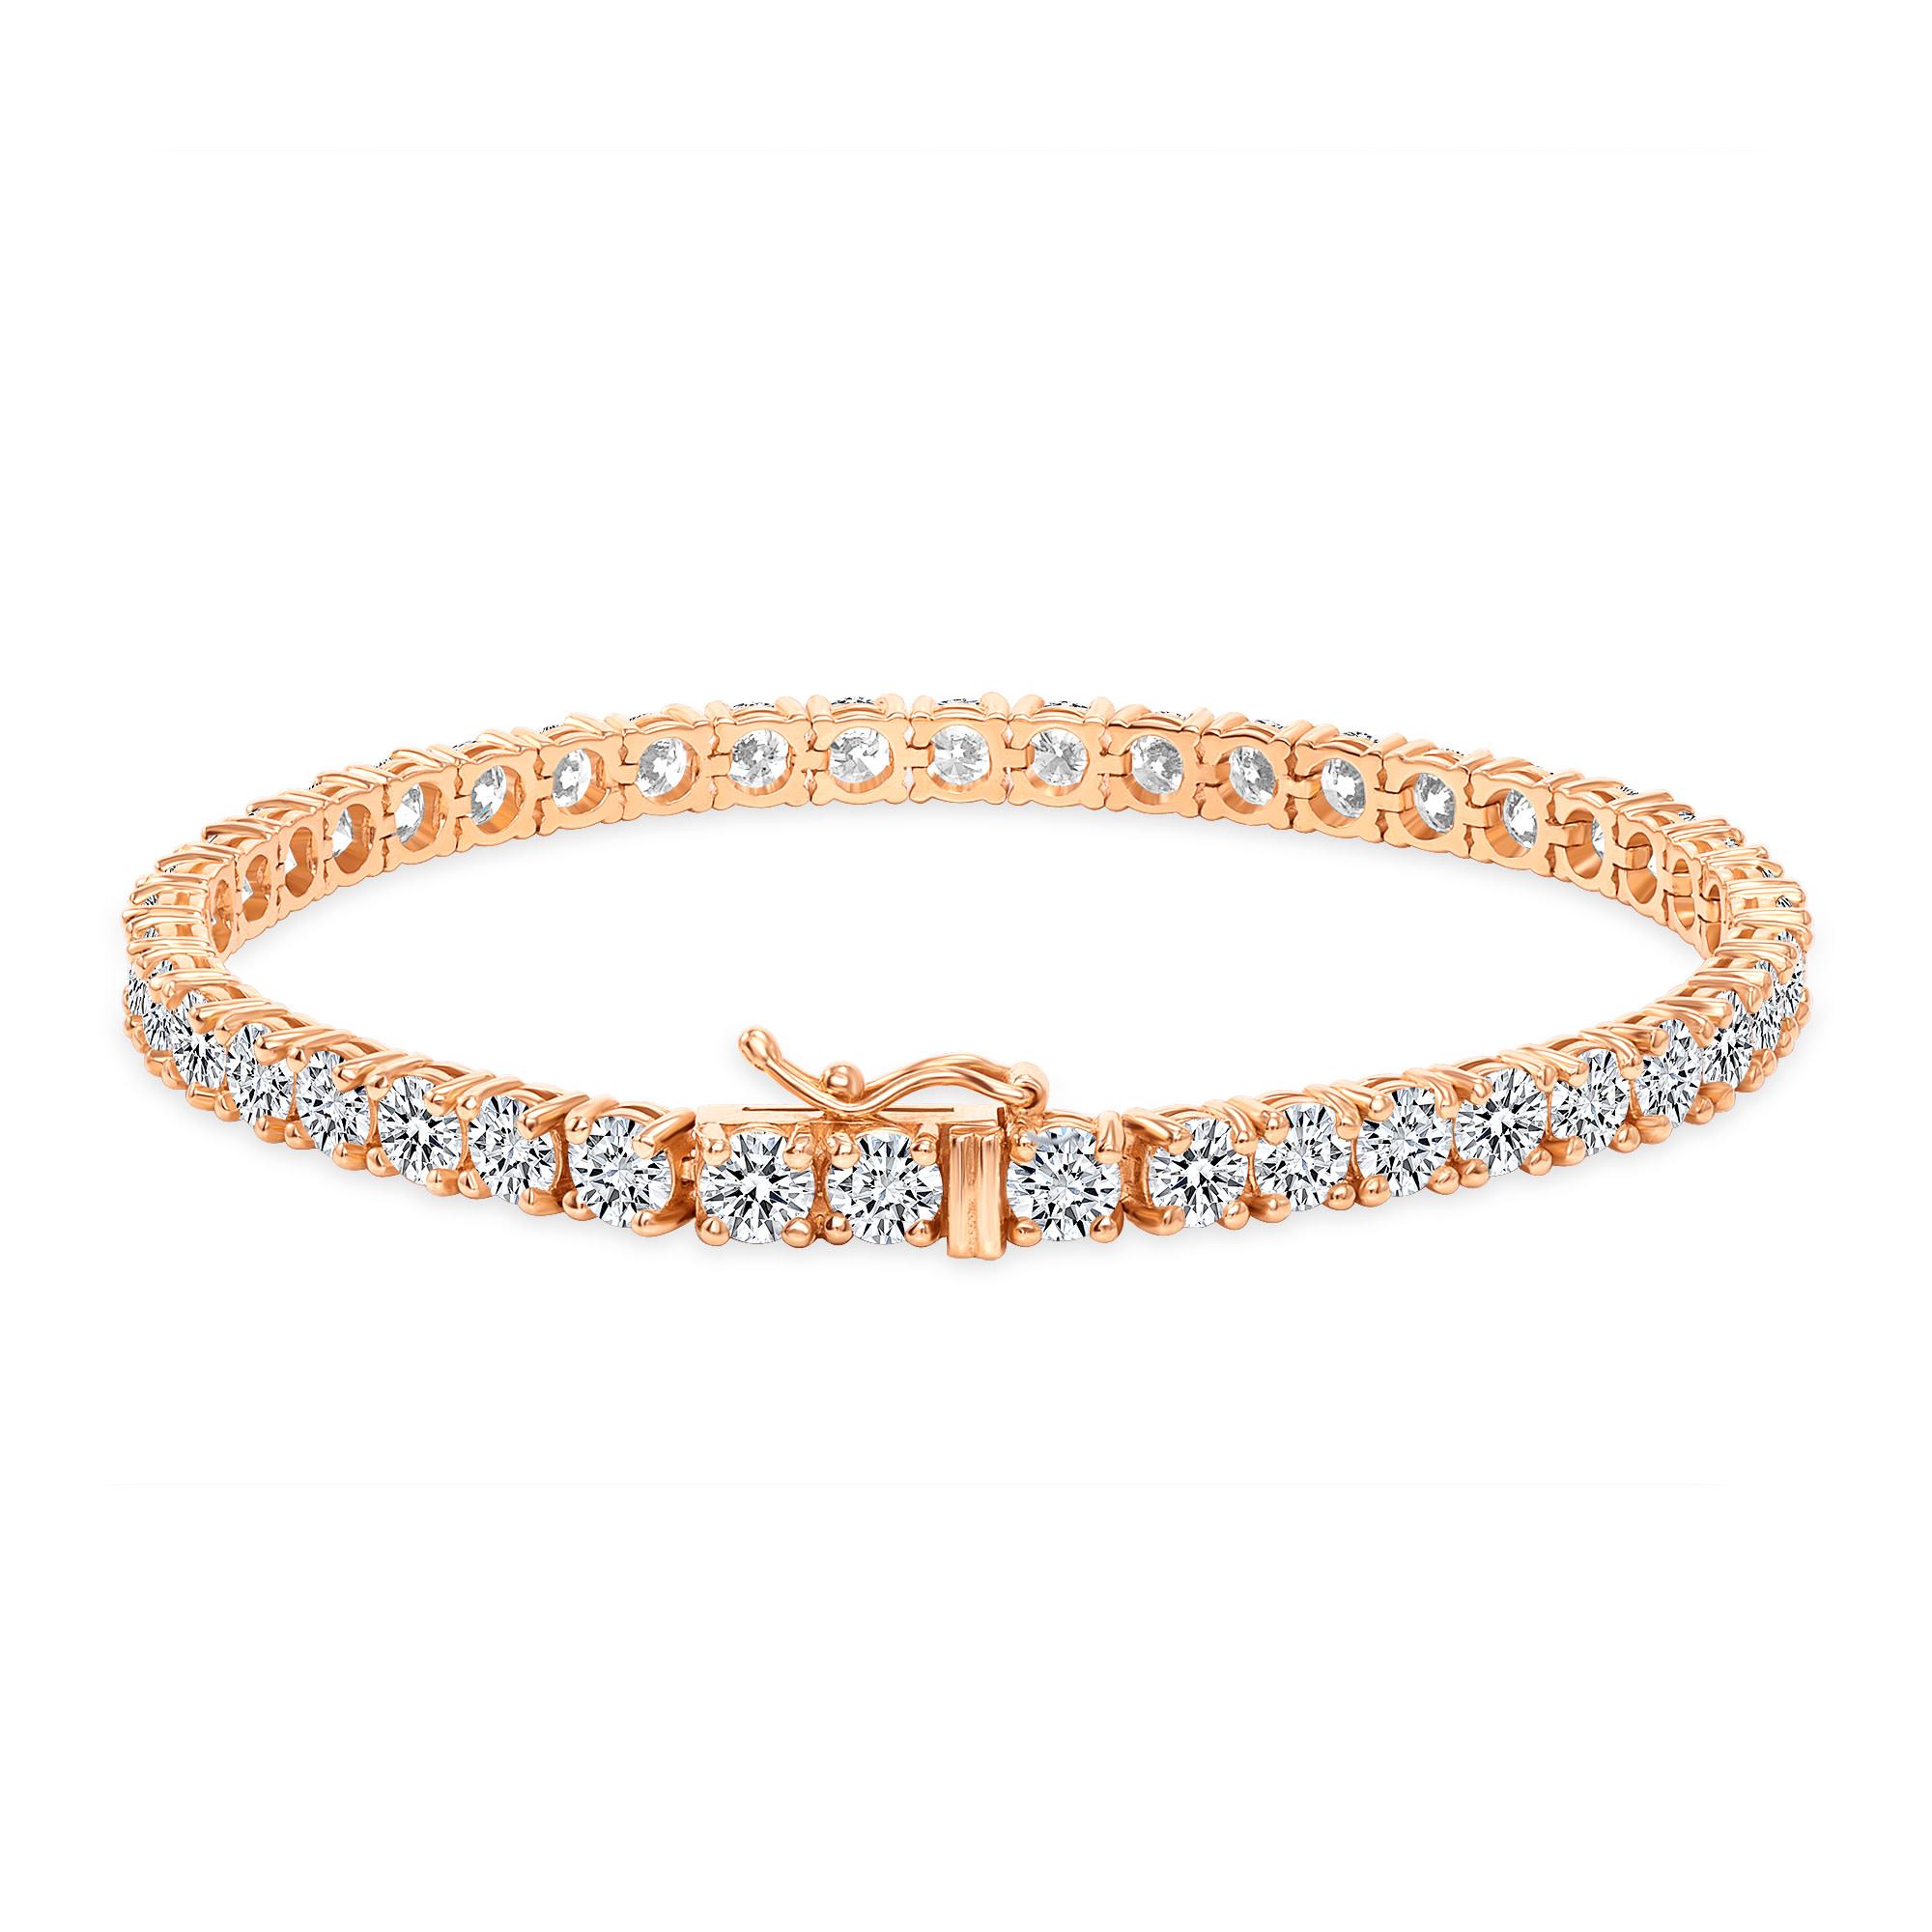 women's tennis bracelets | 14k diamond tennis bracelets | 14k gold tennis bracelets